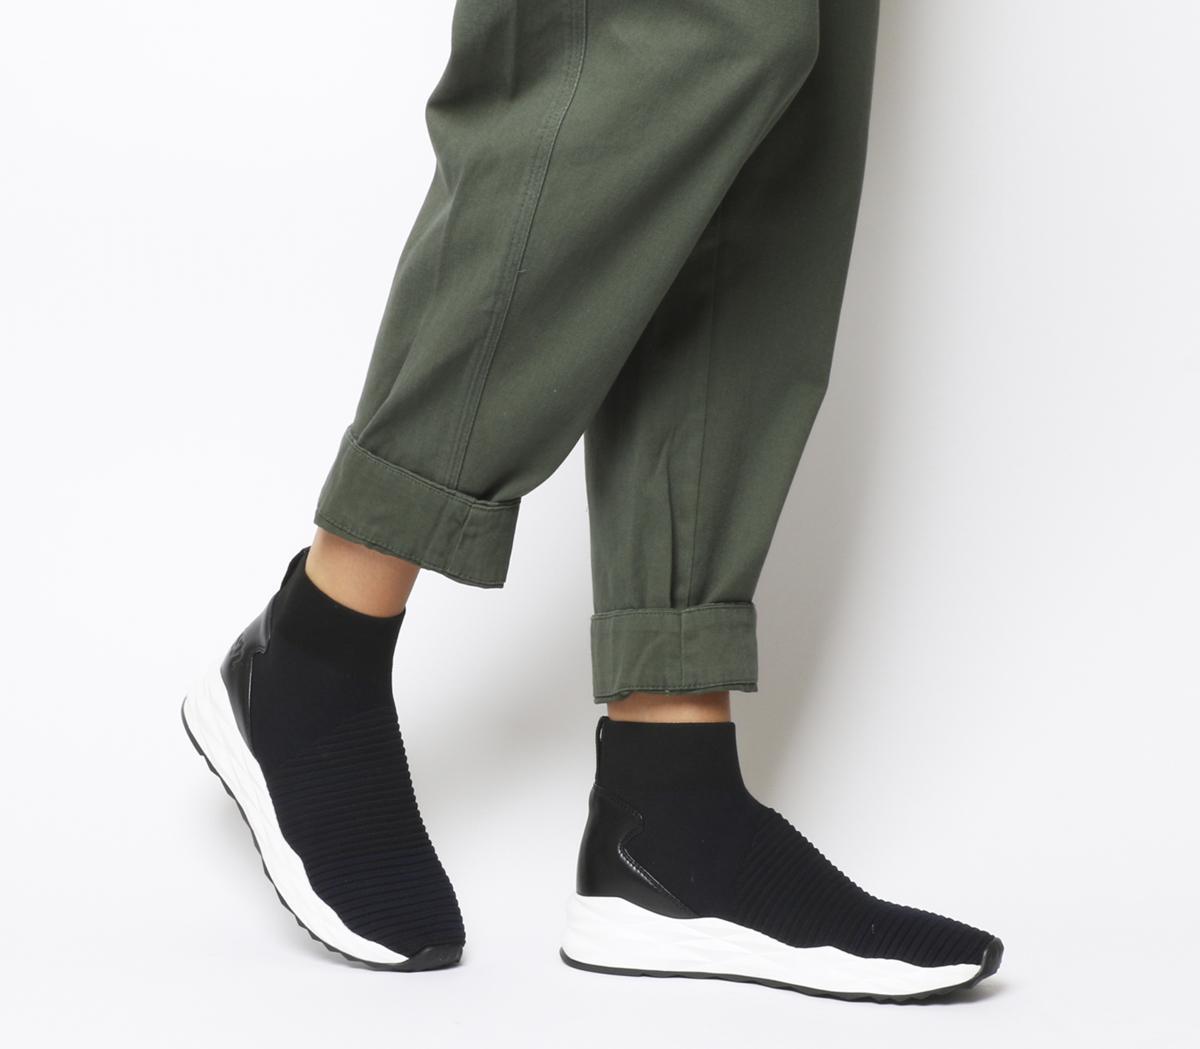 Ash Spot Sneakers Midnight Black - Hers